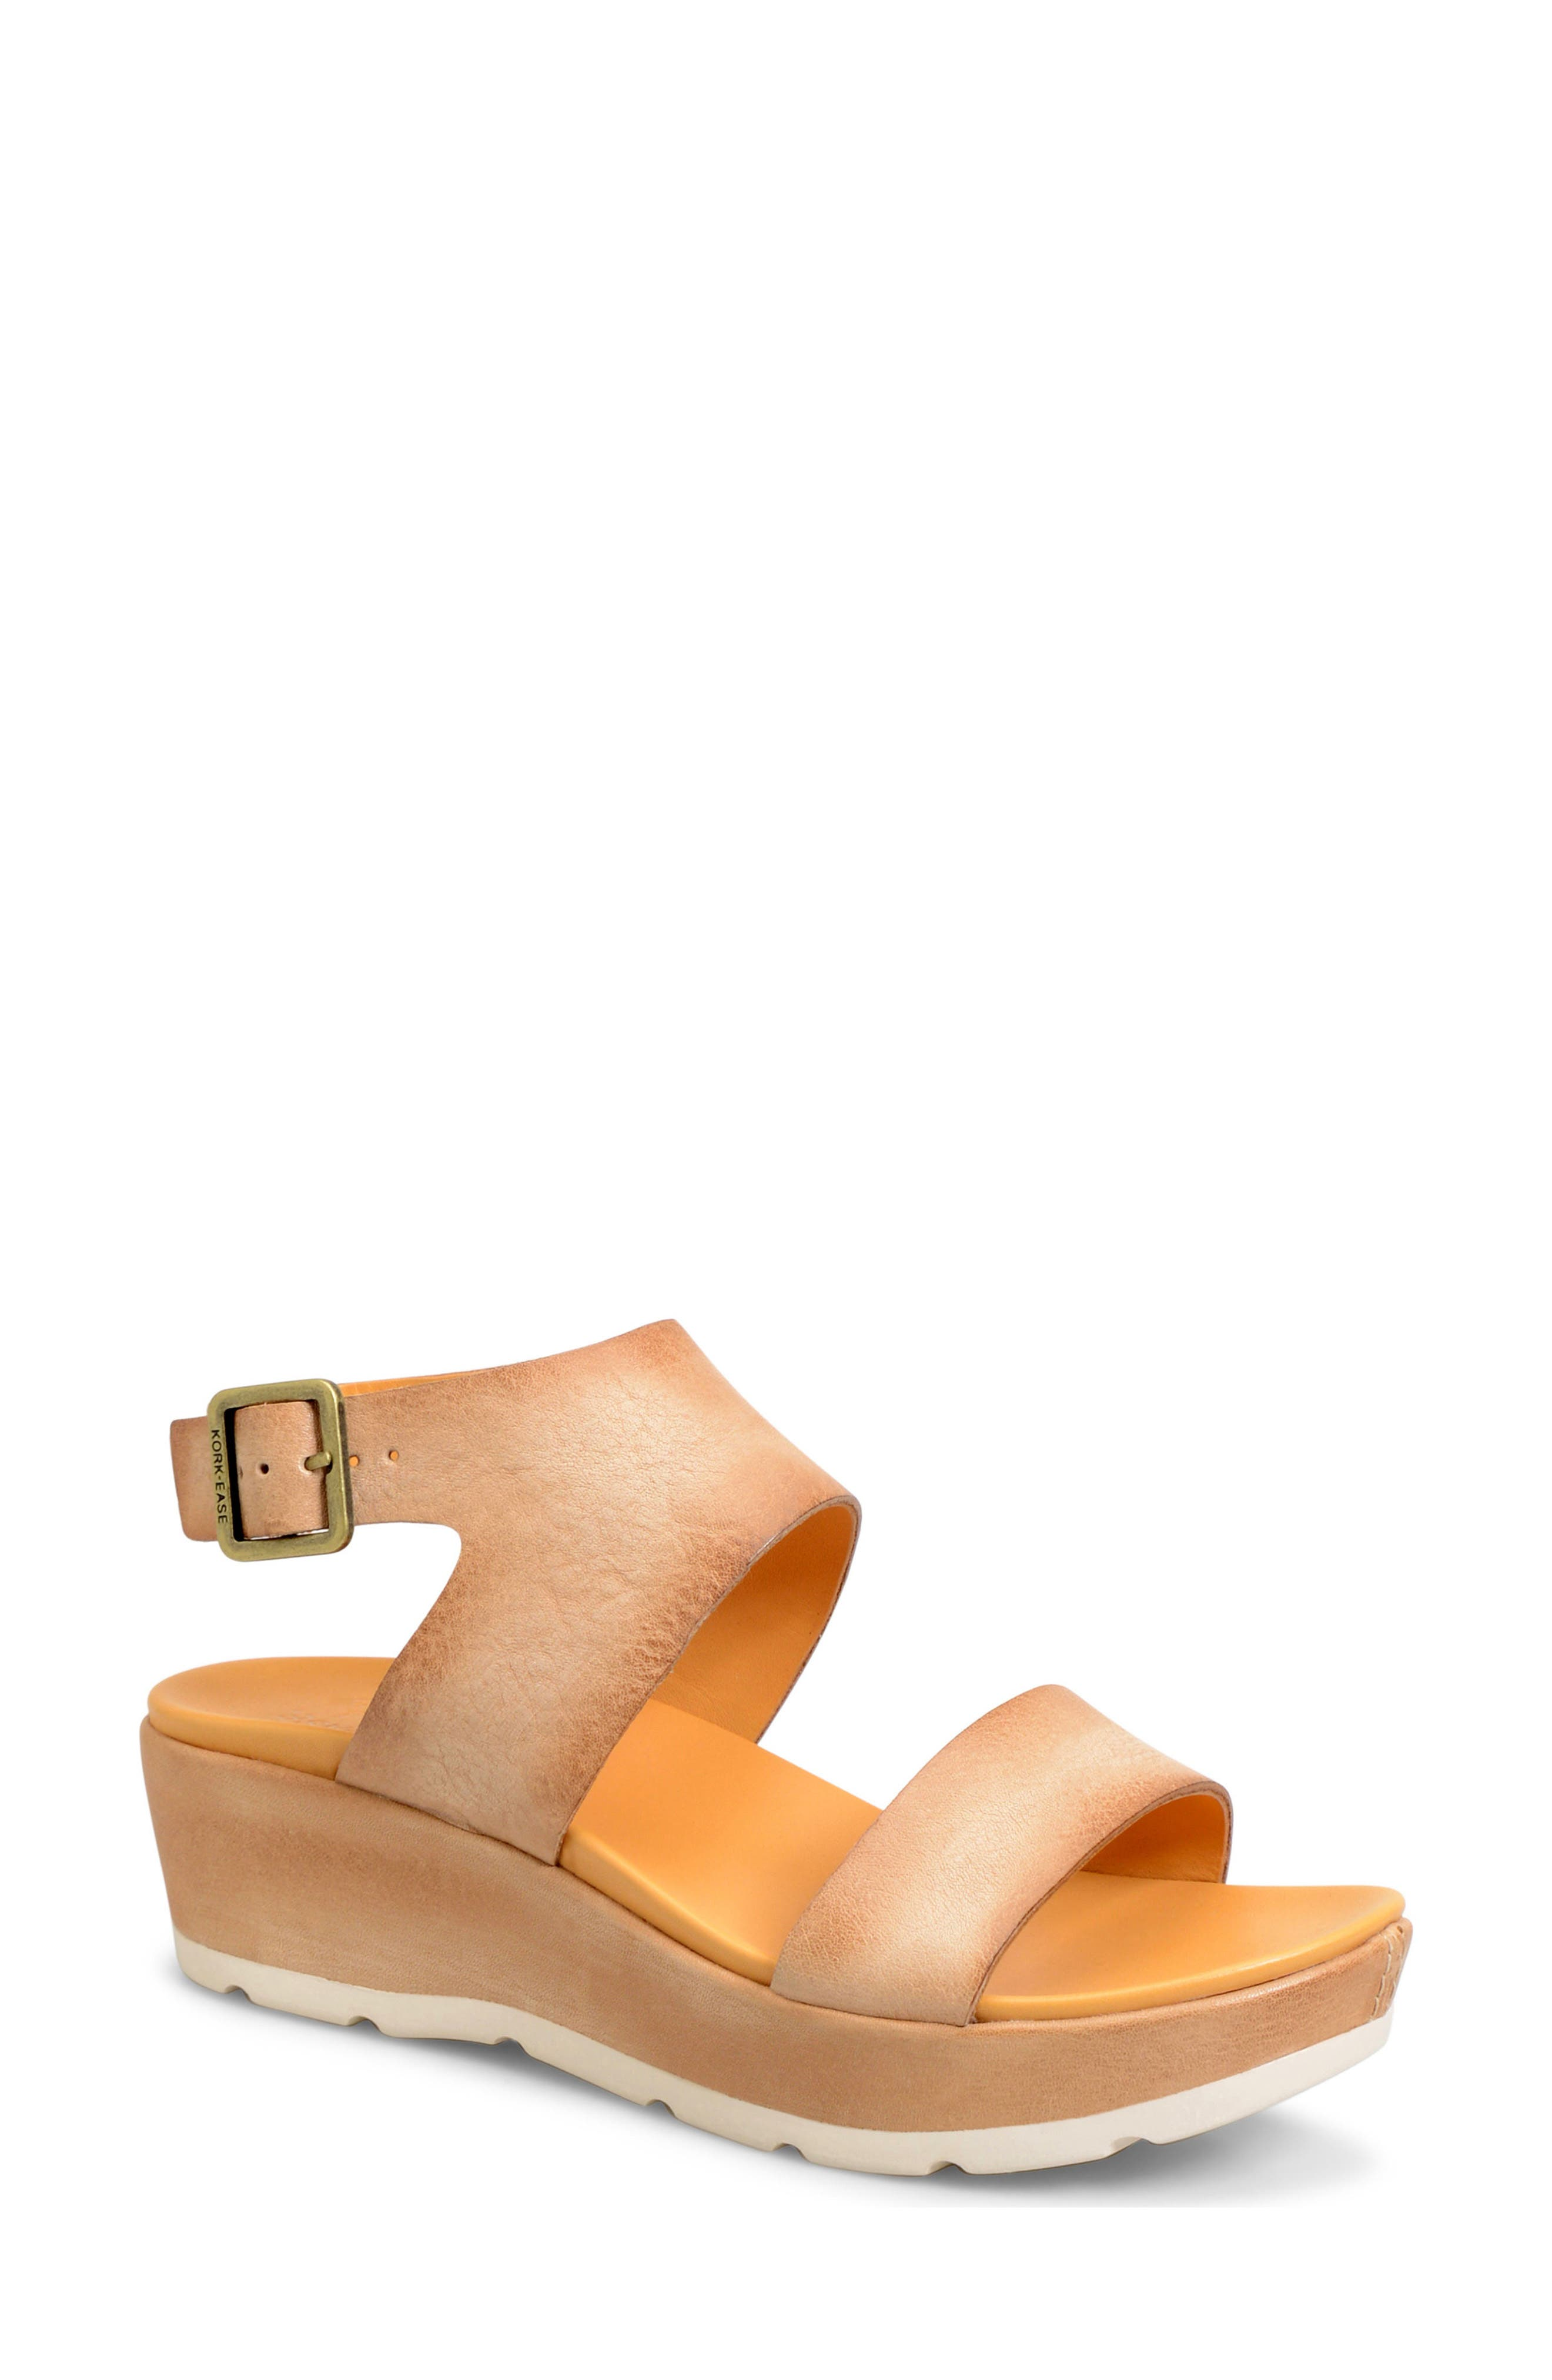 'Khloe' Platform Wedge Sandal,                             Main thumbnail 1, color,                             Natural Leather